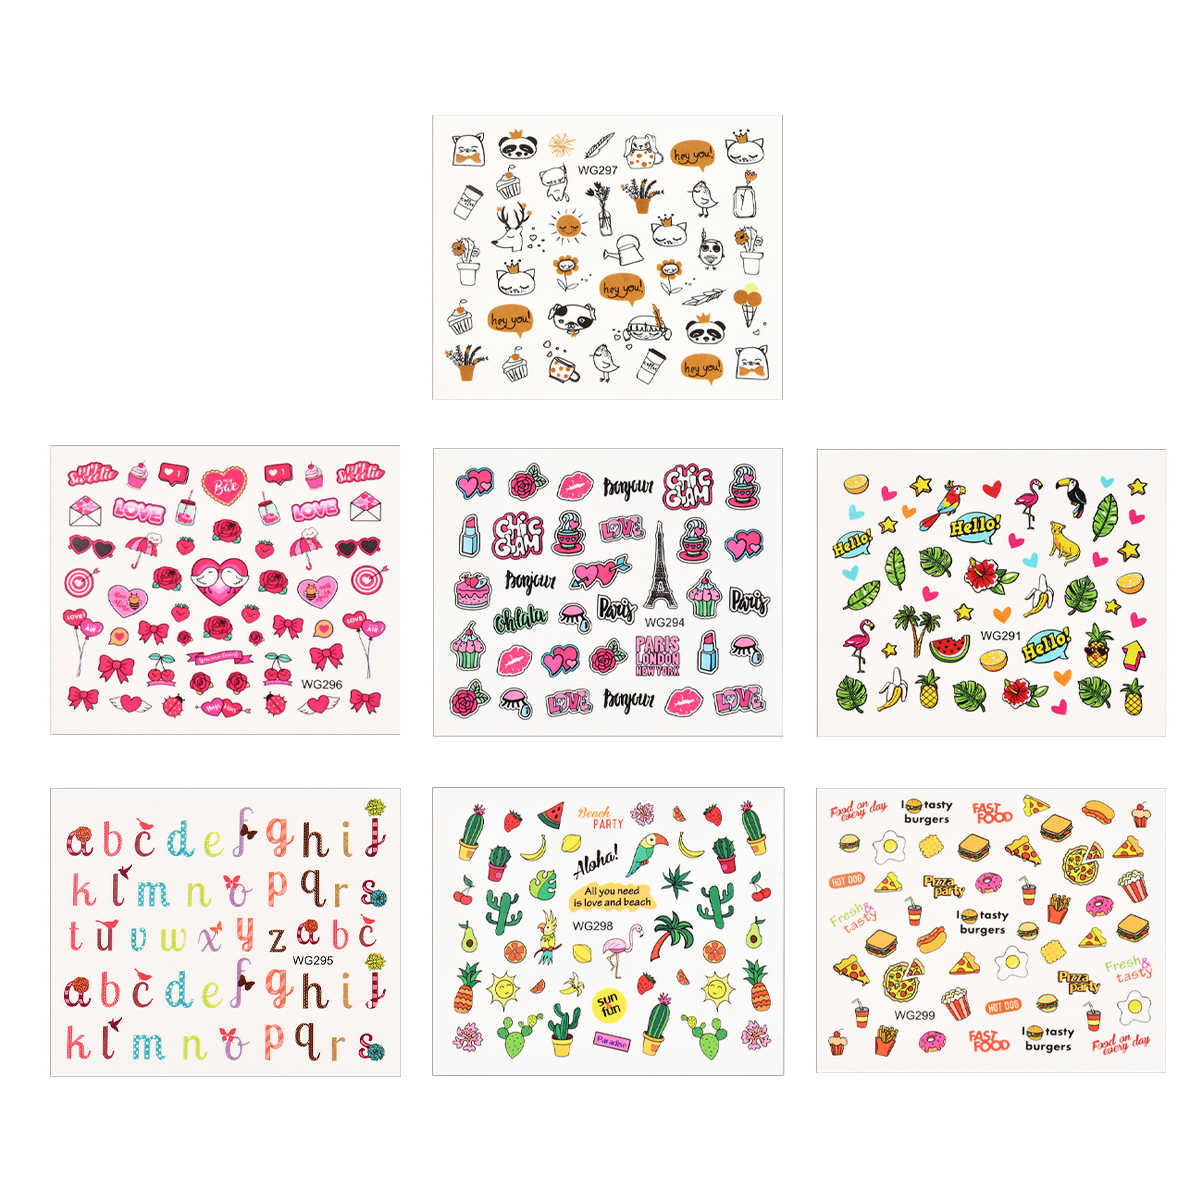 1pcs 여름 Partten 네일 아트 스티커 물 Decals 사랑스러운 개 고양이 과일 만화 음식 네일 문신 장식에 대 한 슬라이더를 래핑